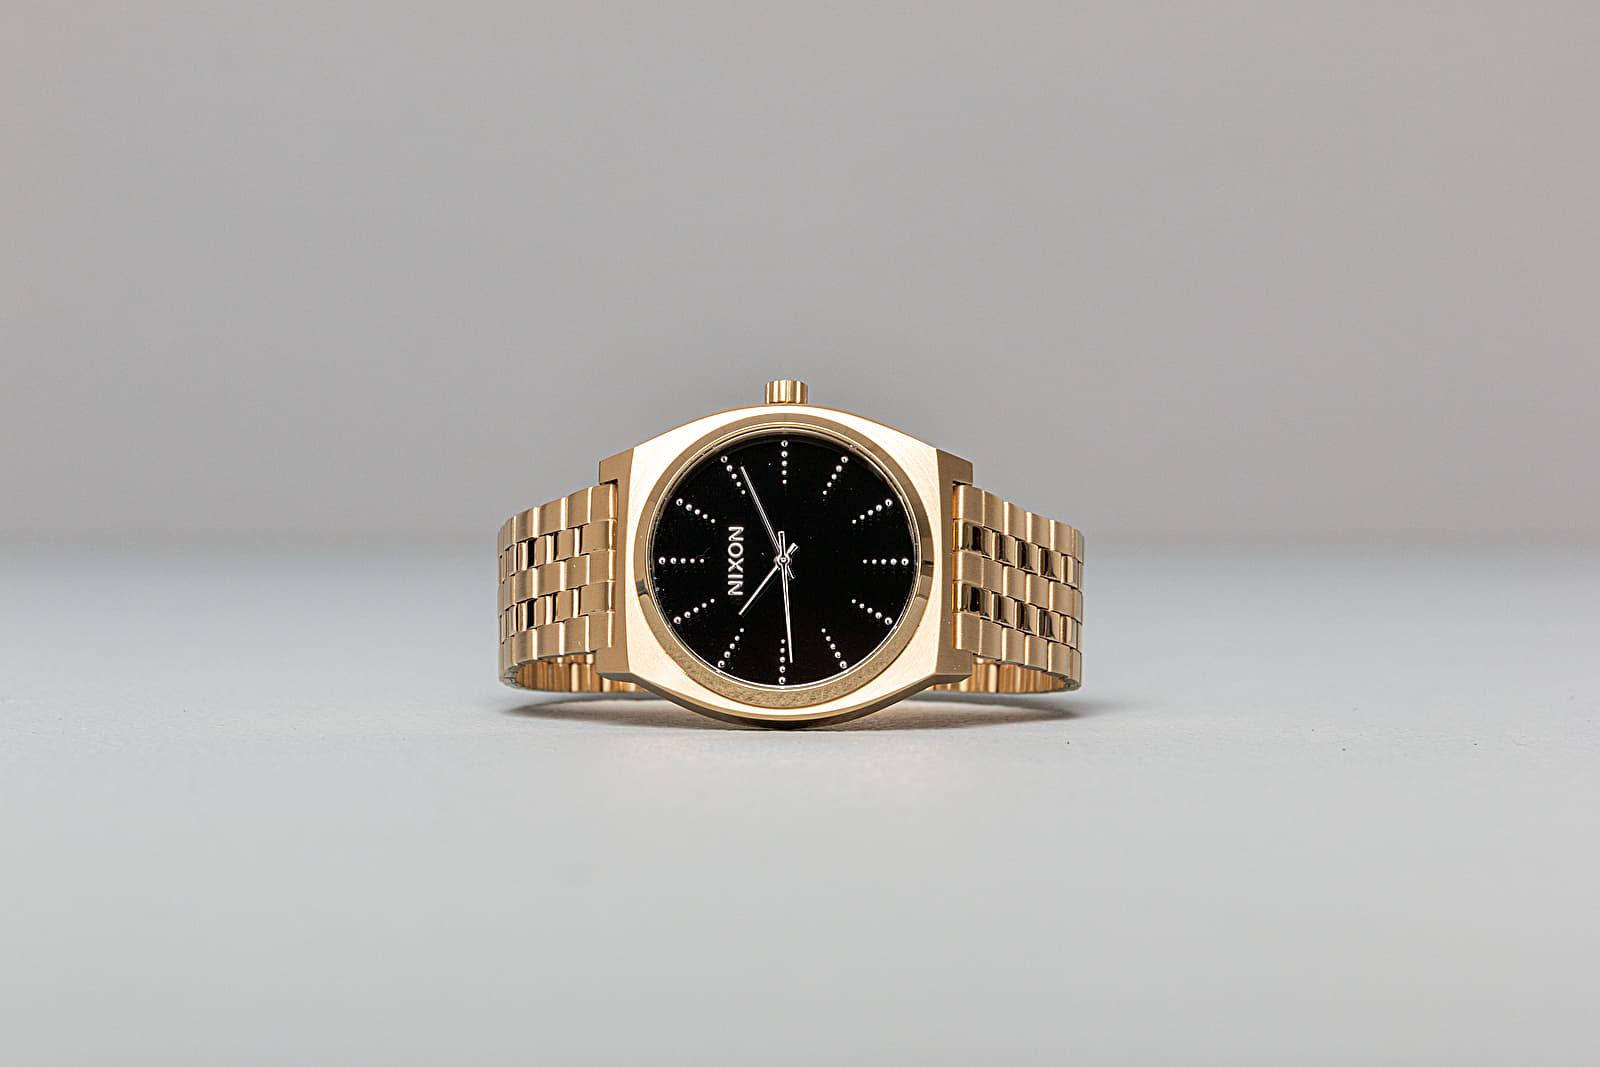 Nixon Time Teller Watches